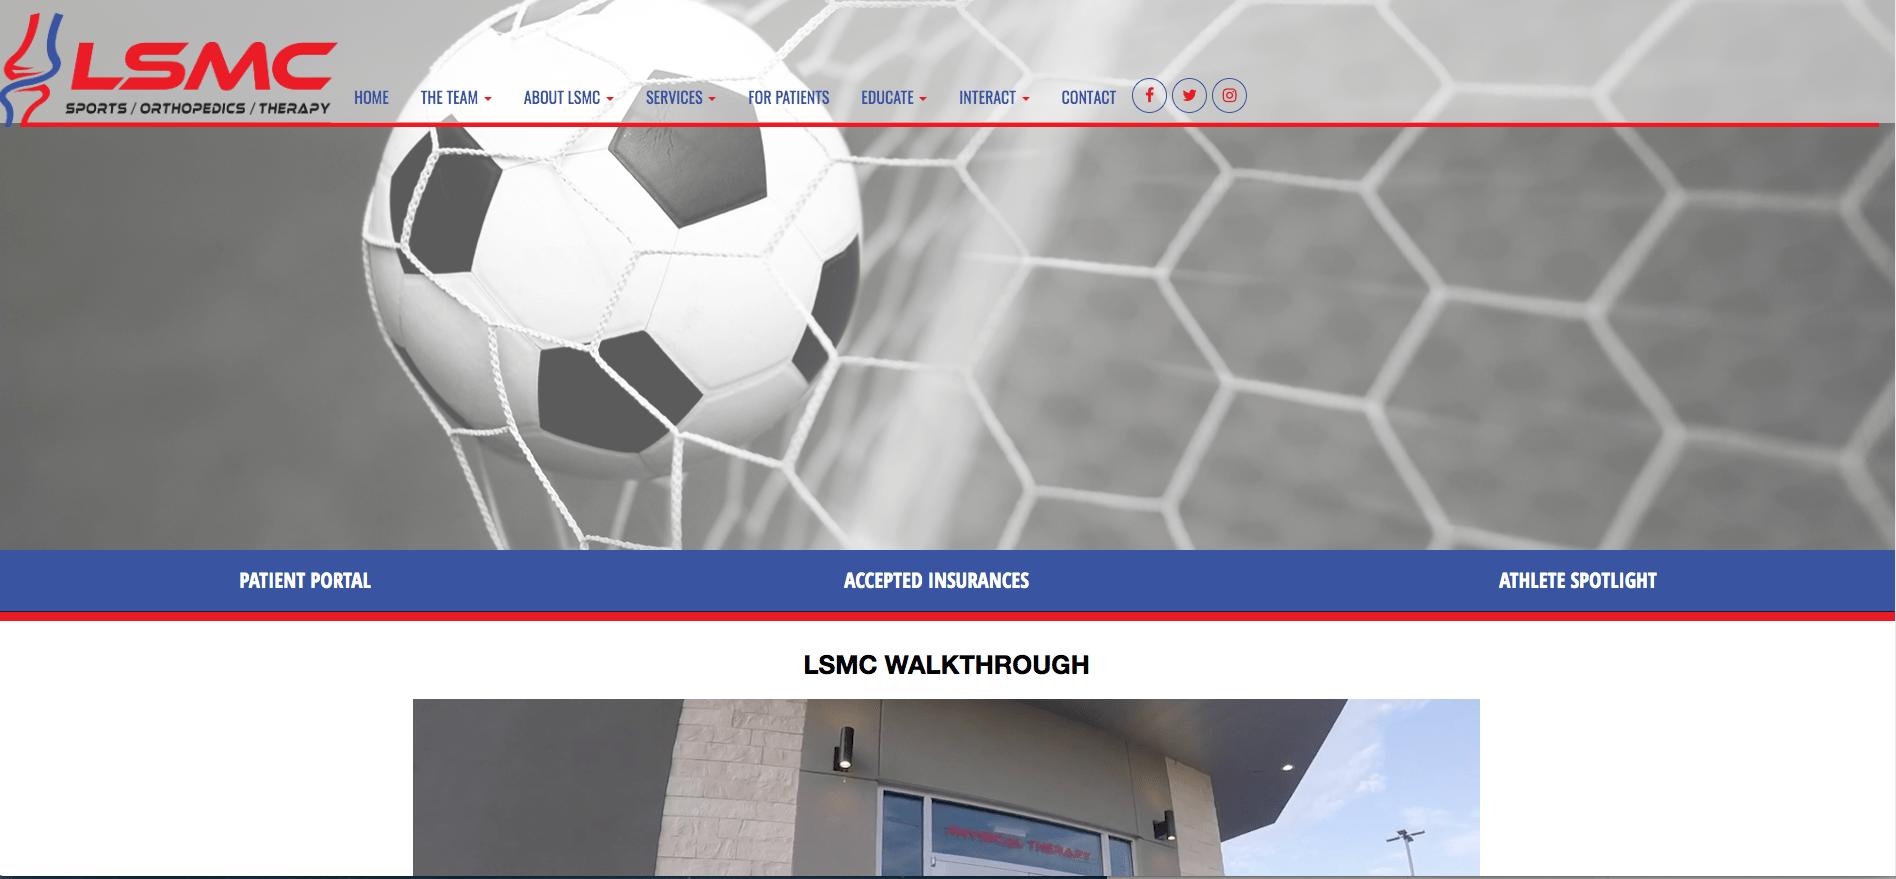 LSMC website